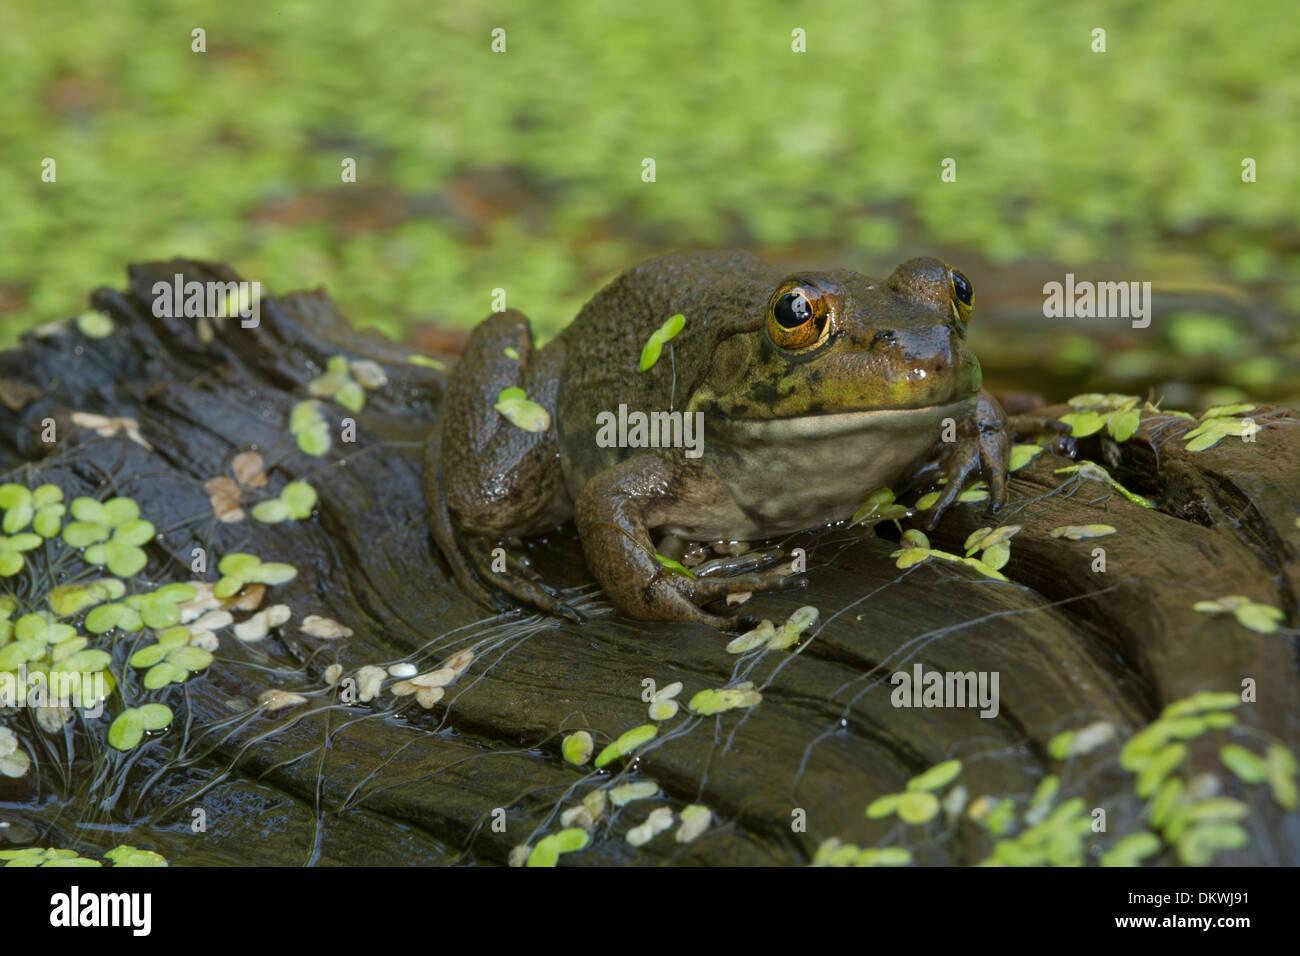 American bullfrog (Lithobates catesbeianus), Rana catesbeiana Stock Photo